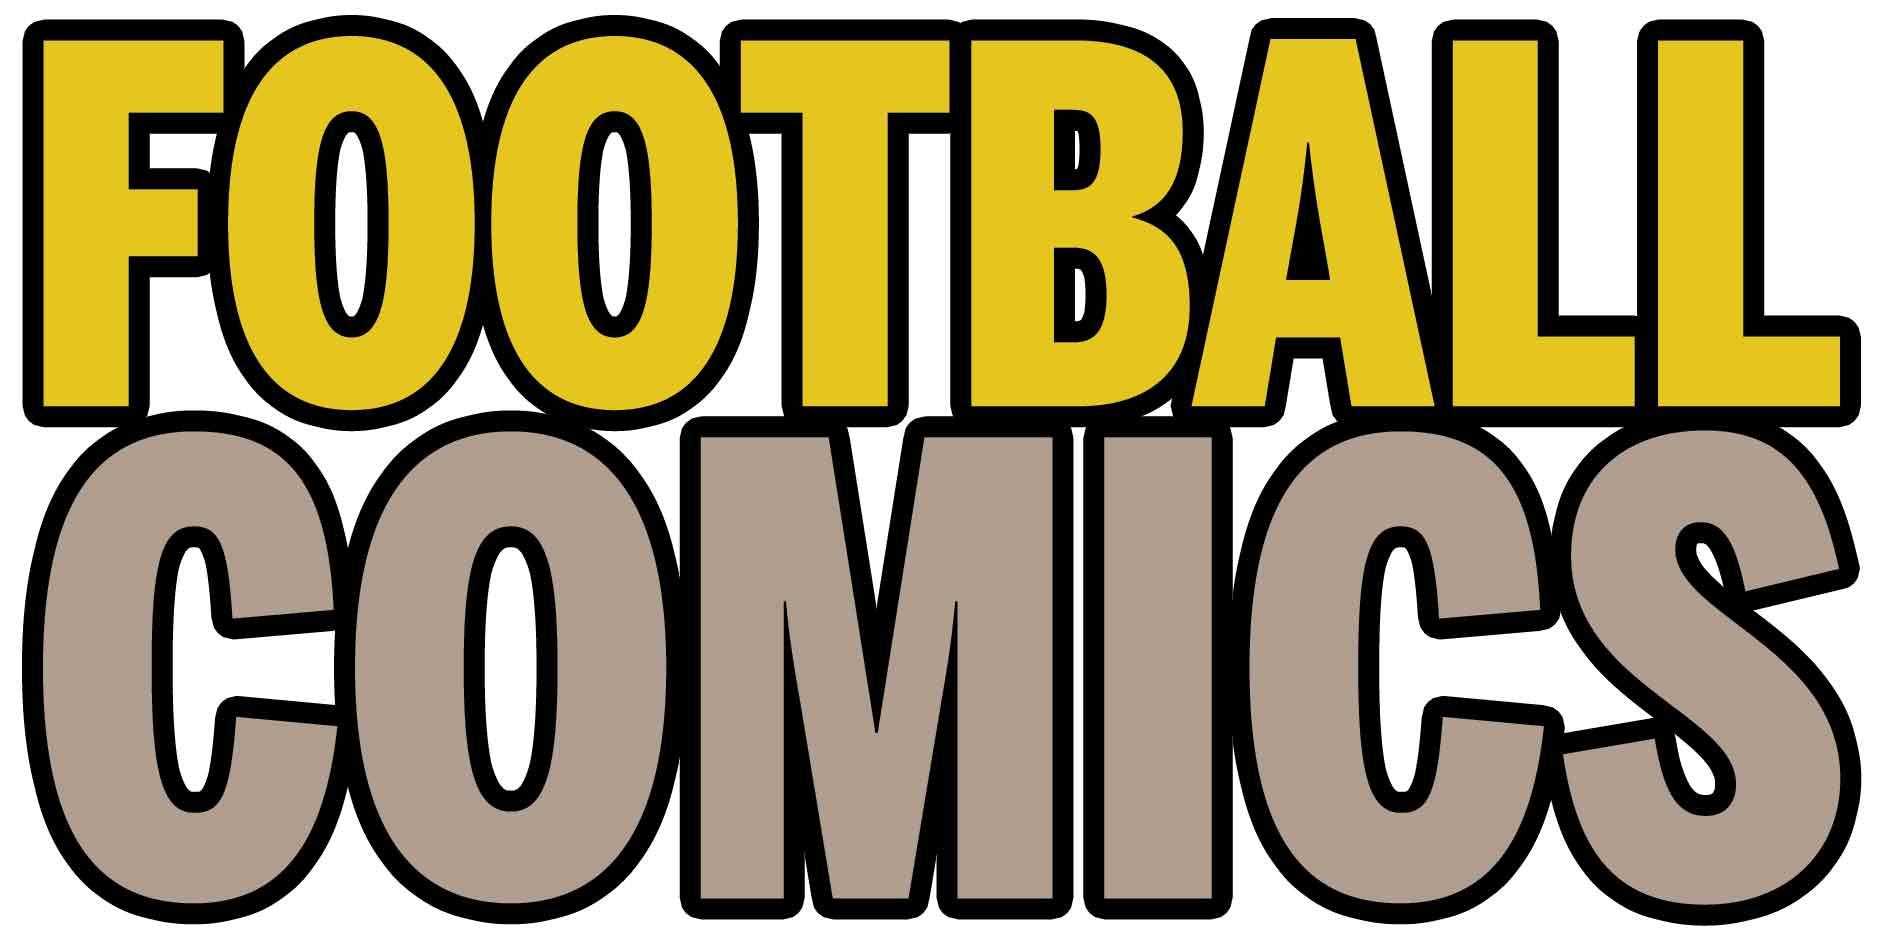 Football Comics